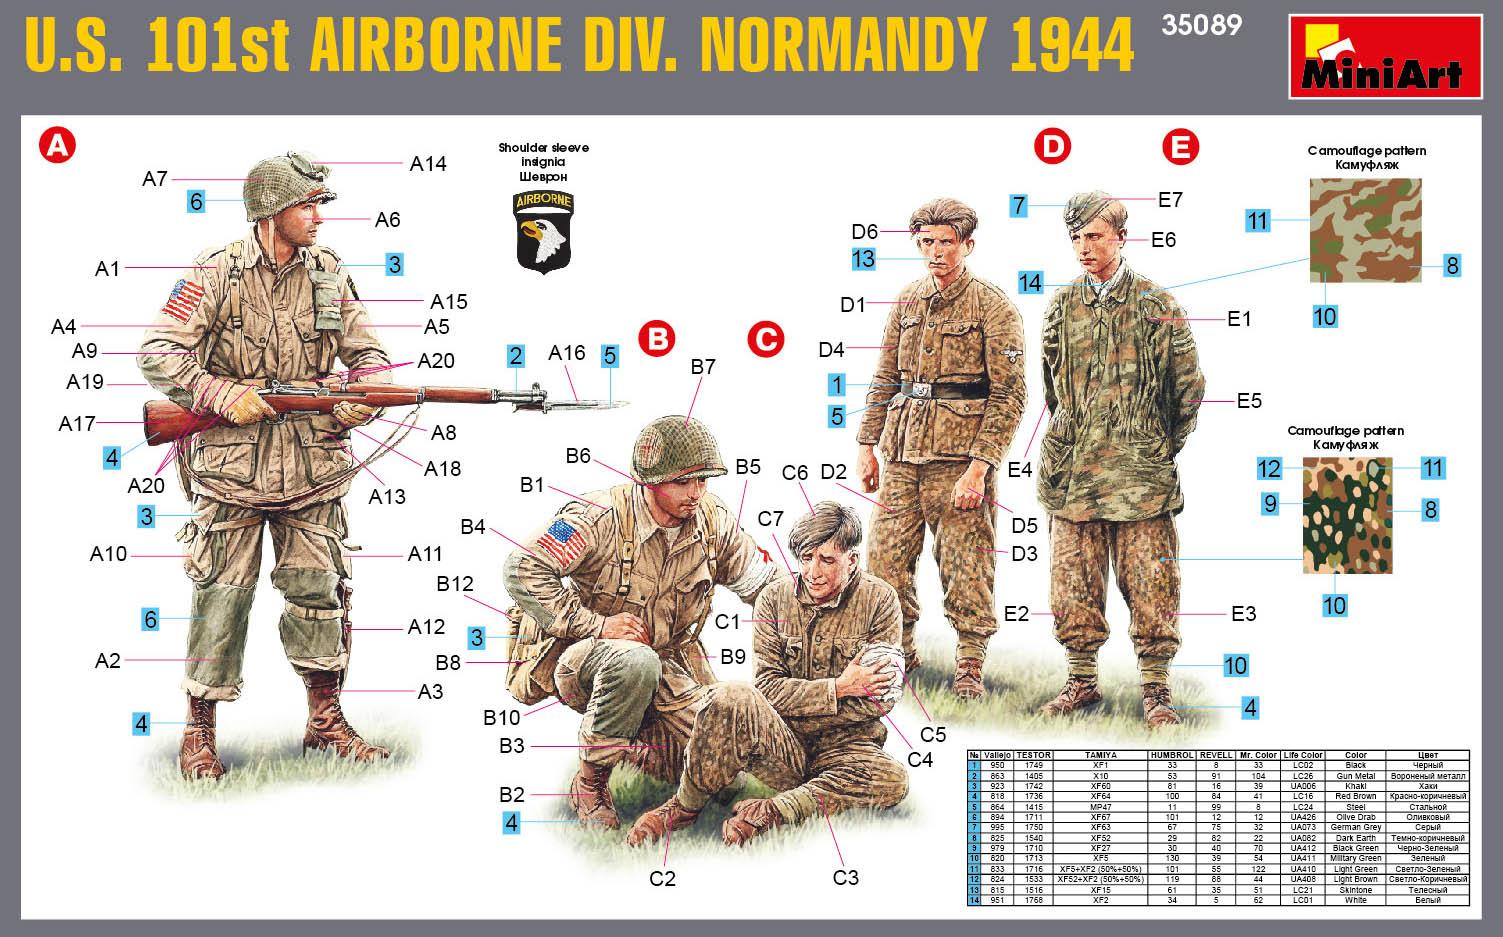 35089 U.S. 101st AIRBORNE DIVISION (NORMANDY 1944)